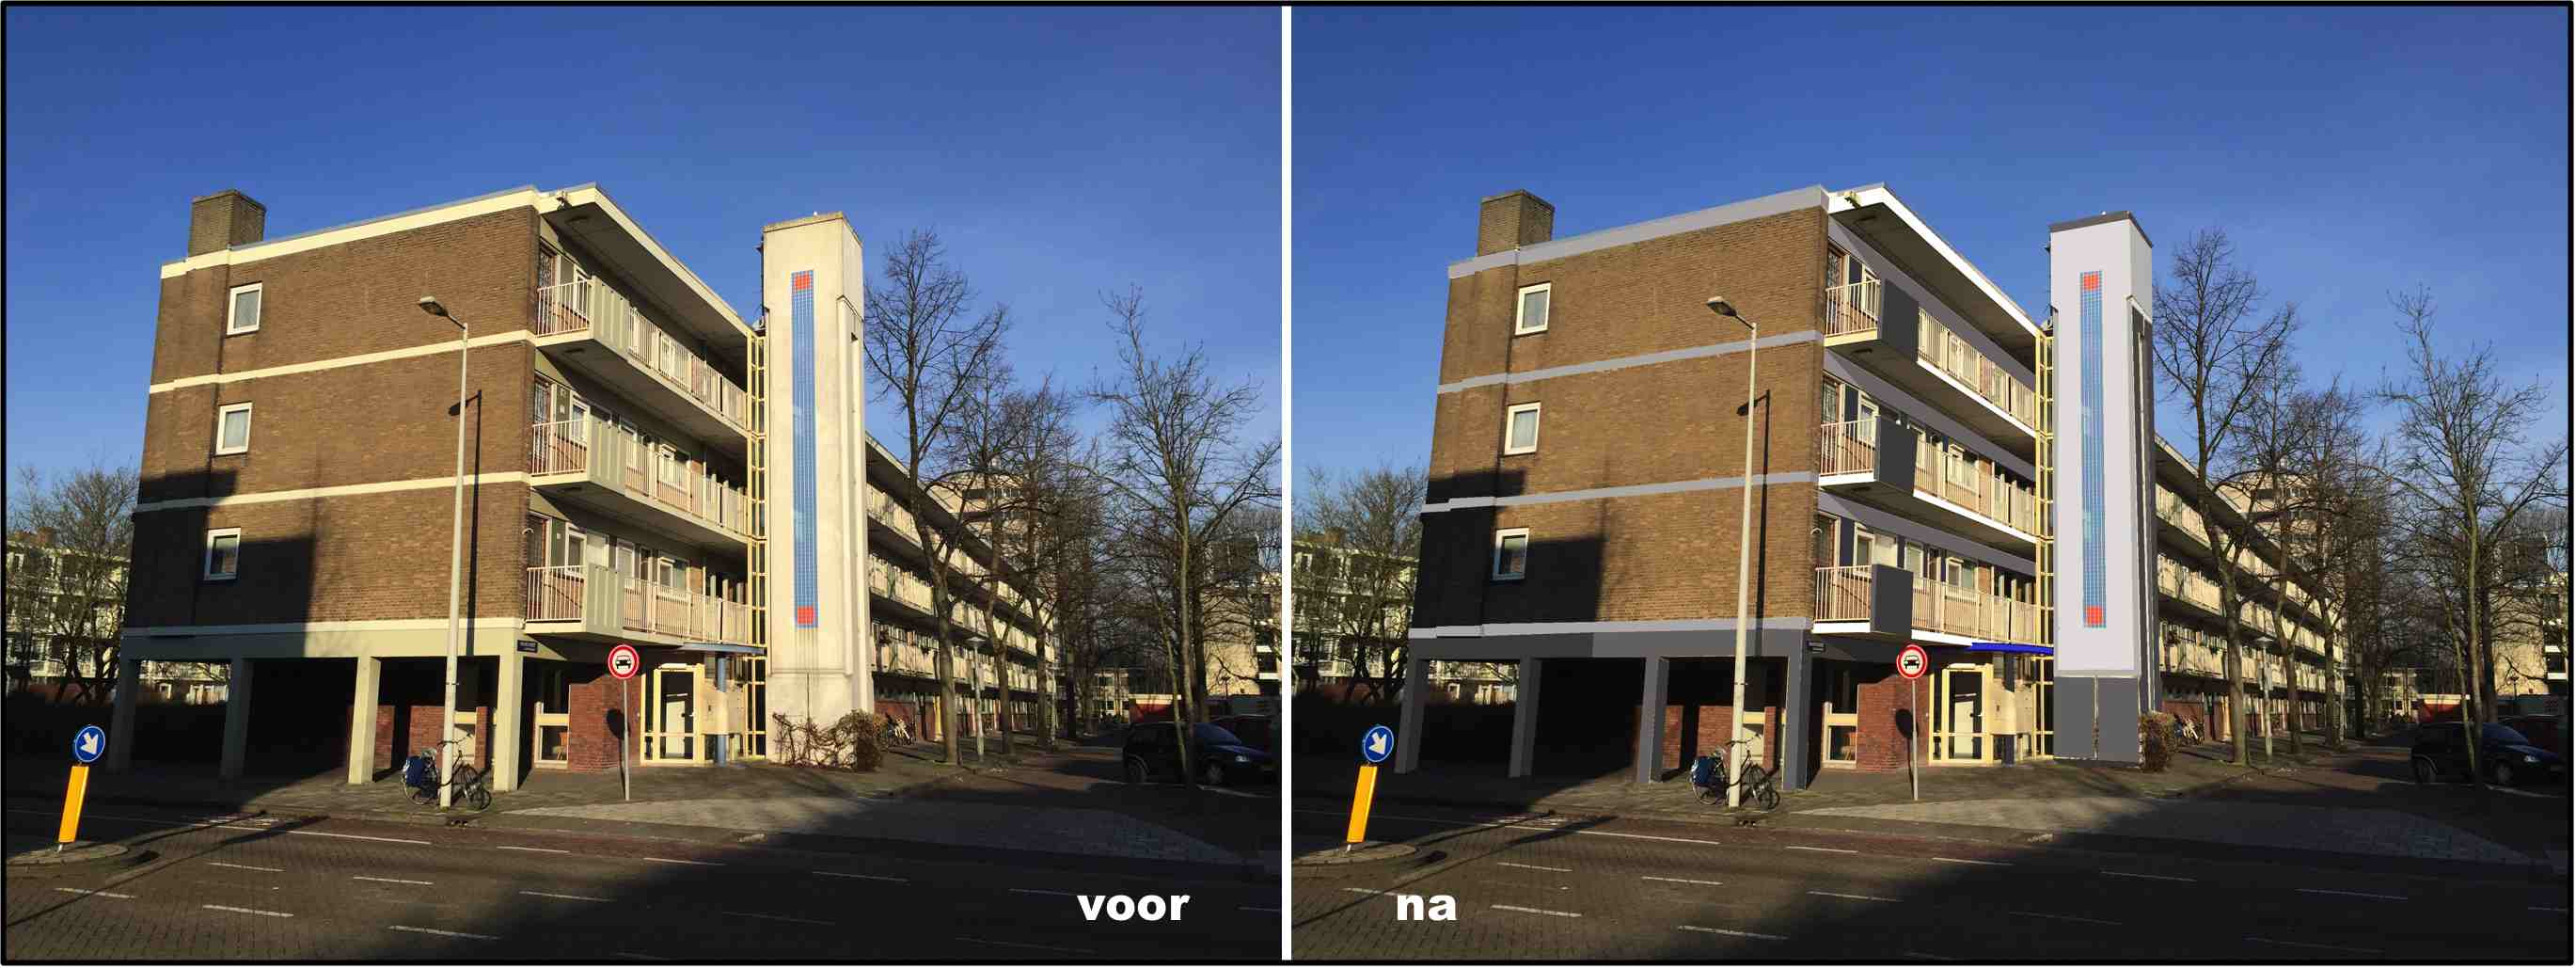 anetgoemans-oldenhorst amsterdam-zuidas-kleurenplan-2